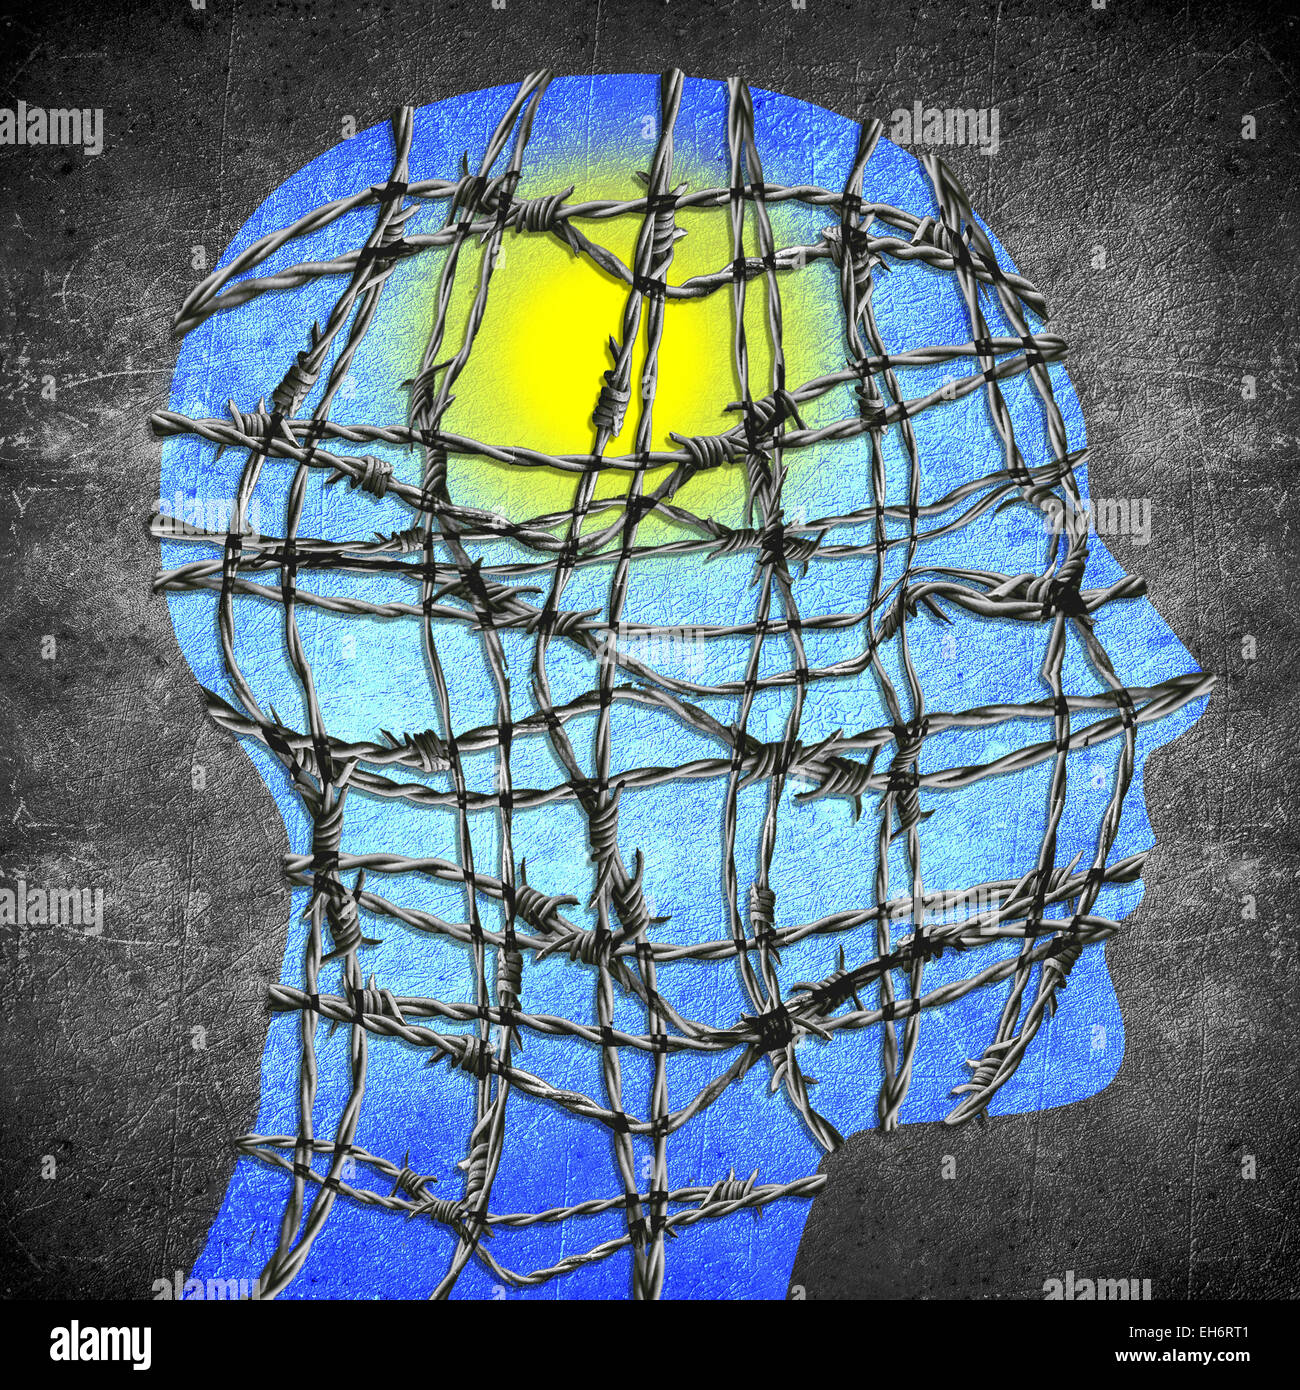 Kopf-Silhouette mit Stacheldraht Sonne und blauer Himmel digitale illustration Stockbild